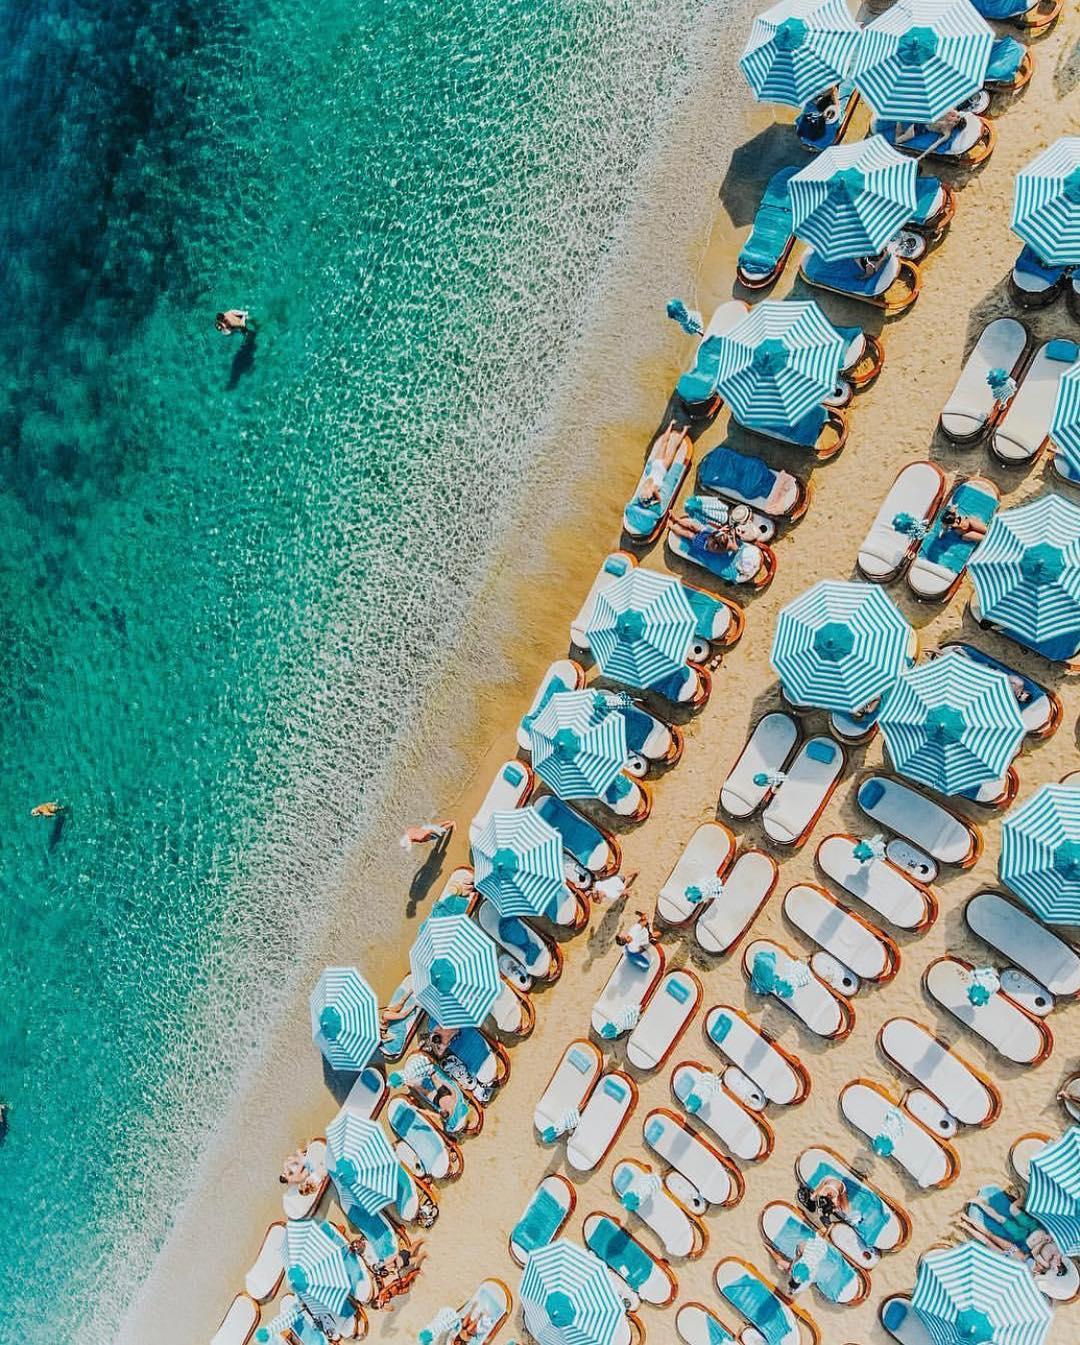 du lịch biển-biển psarou flycam